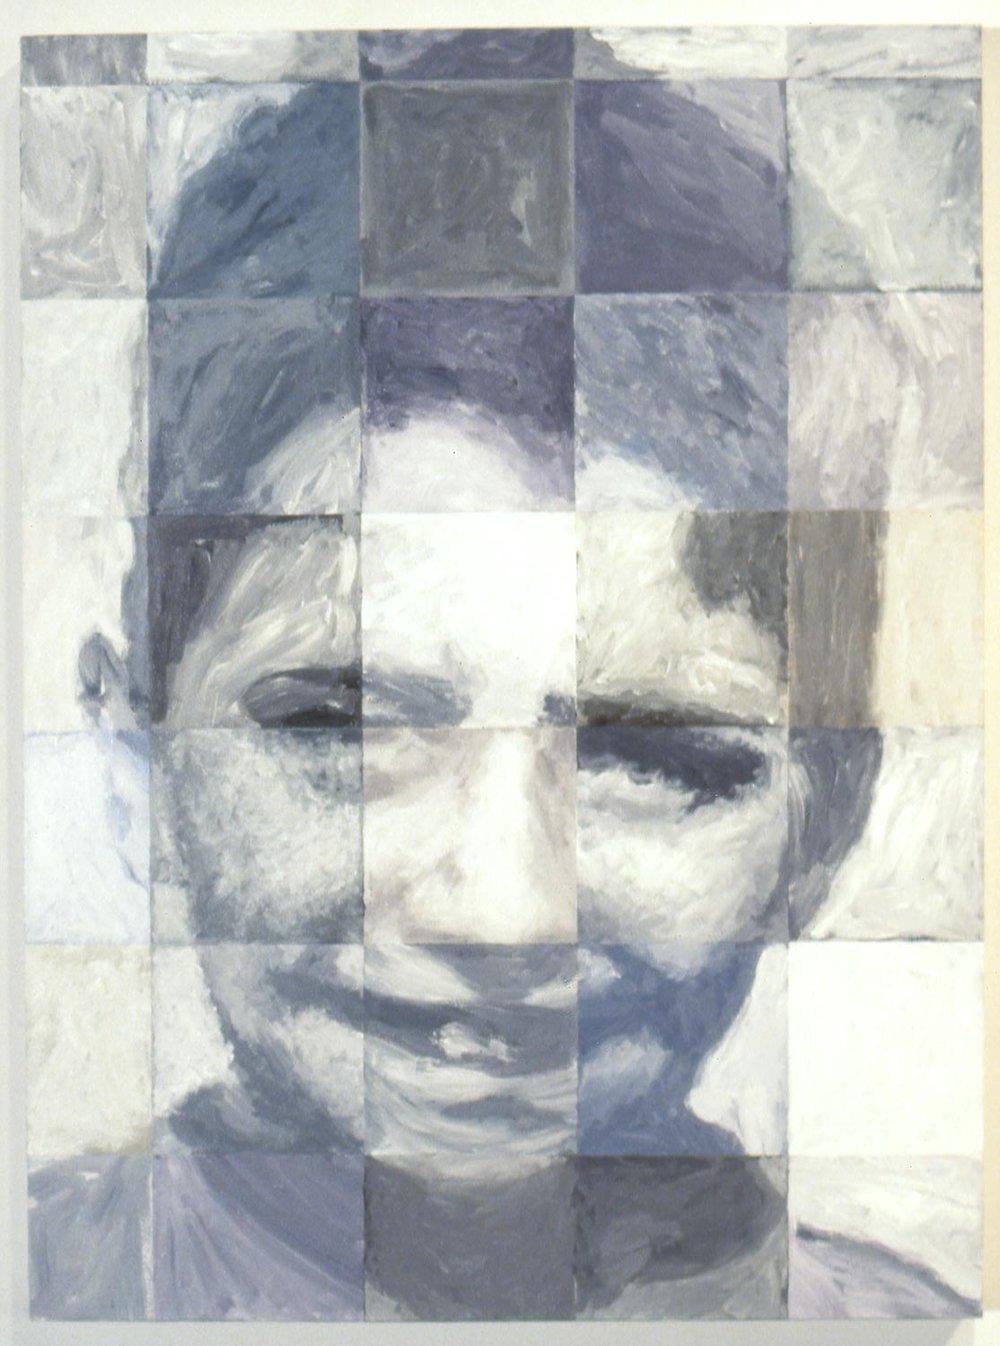 Jeune peinture (Young Painting): Joseph Branco, 1997